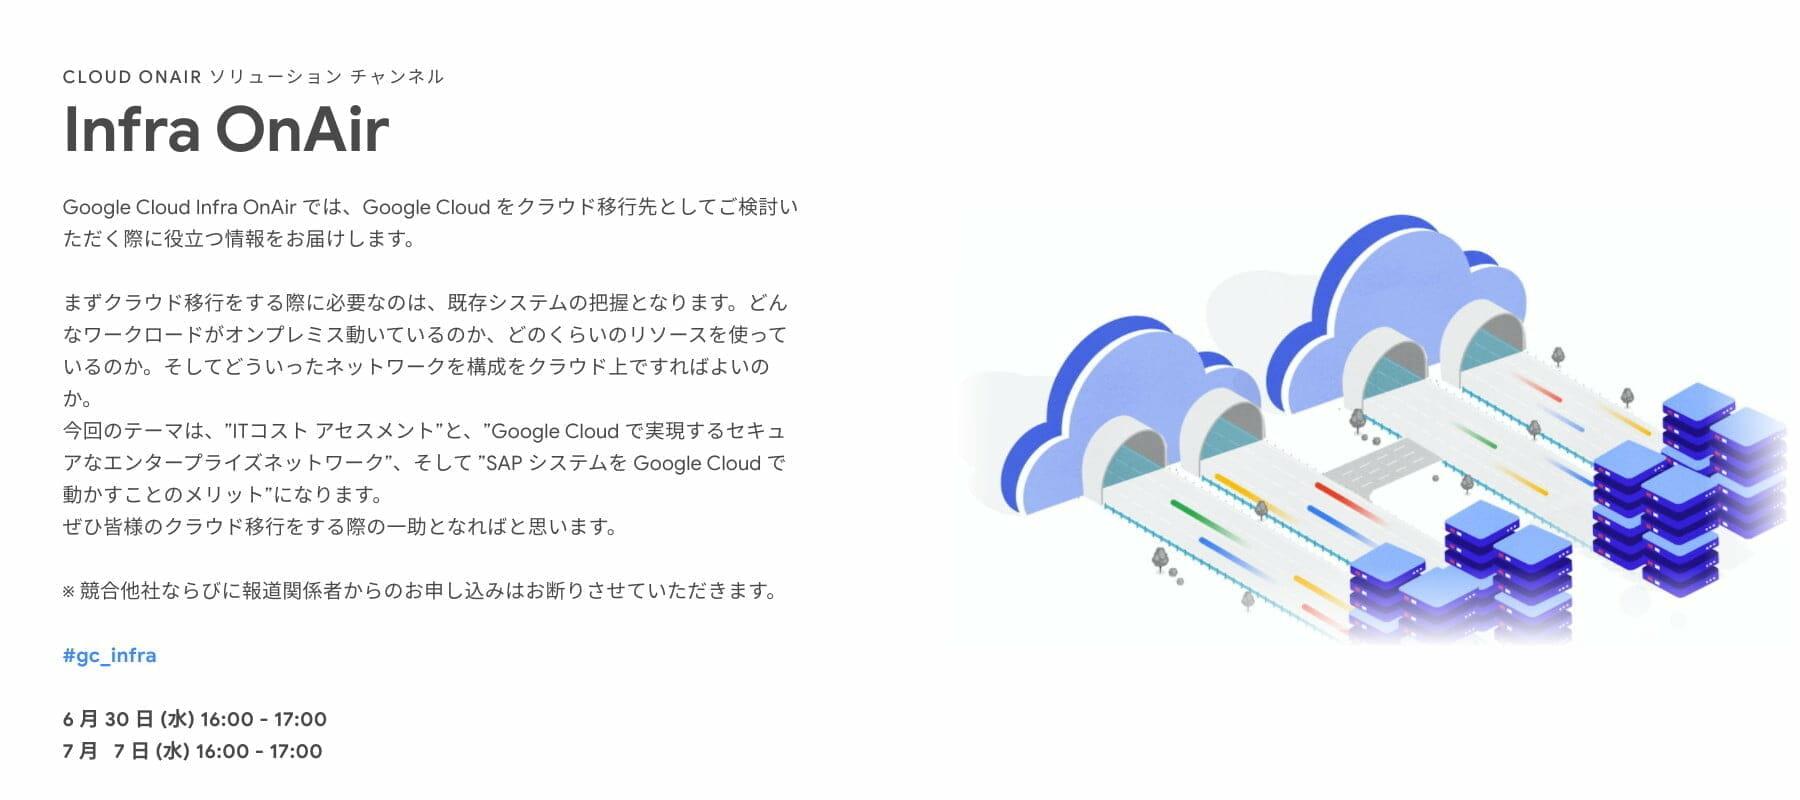 [GCP] Google Cloud Infra OnAir